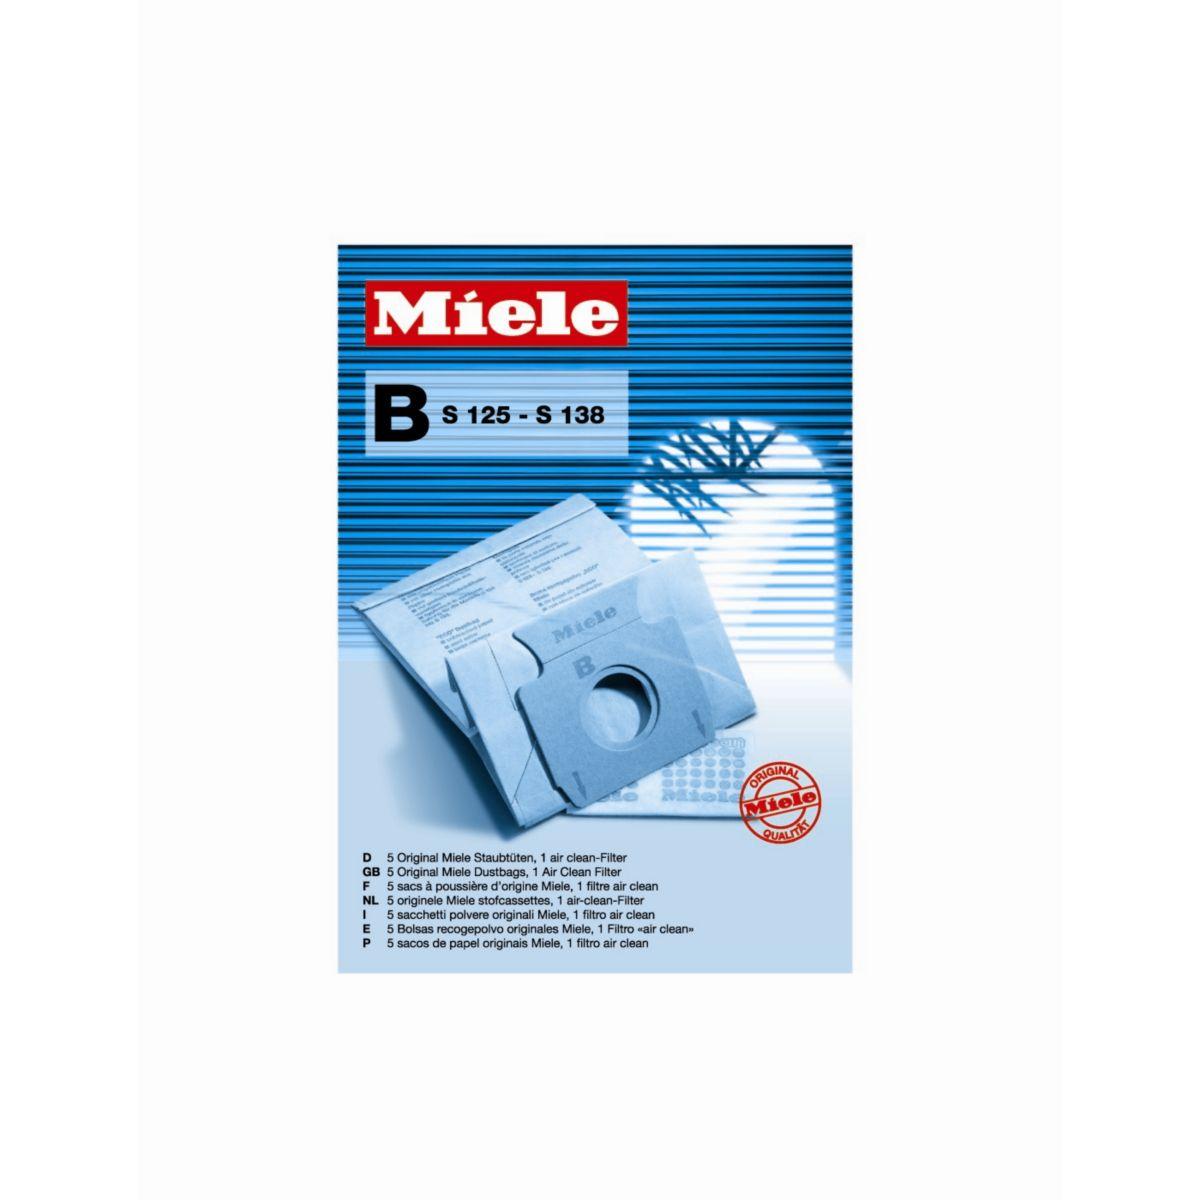 Sac aspirateur MIELE P125B (S125-138)